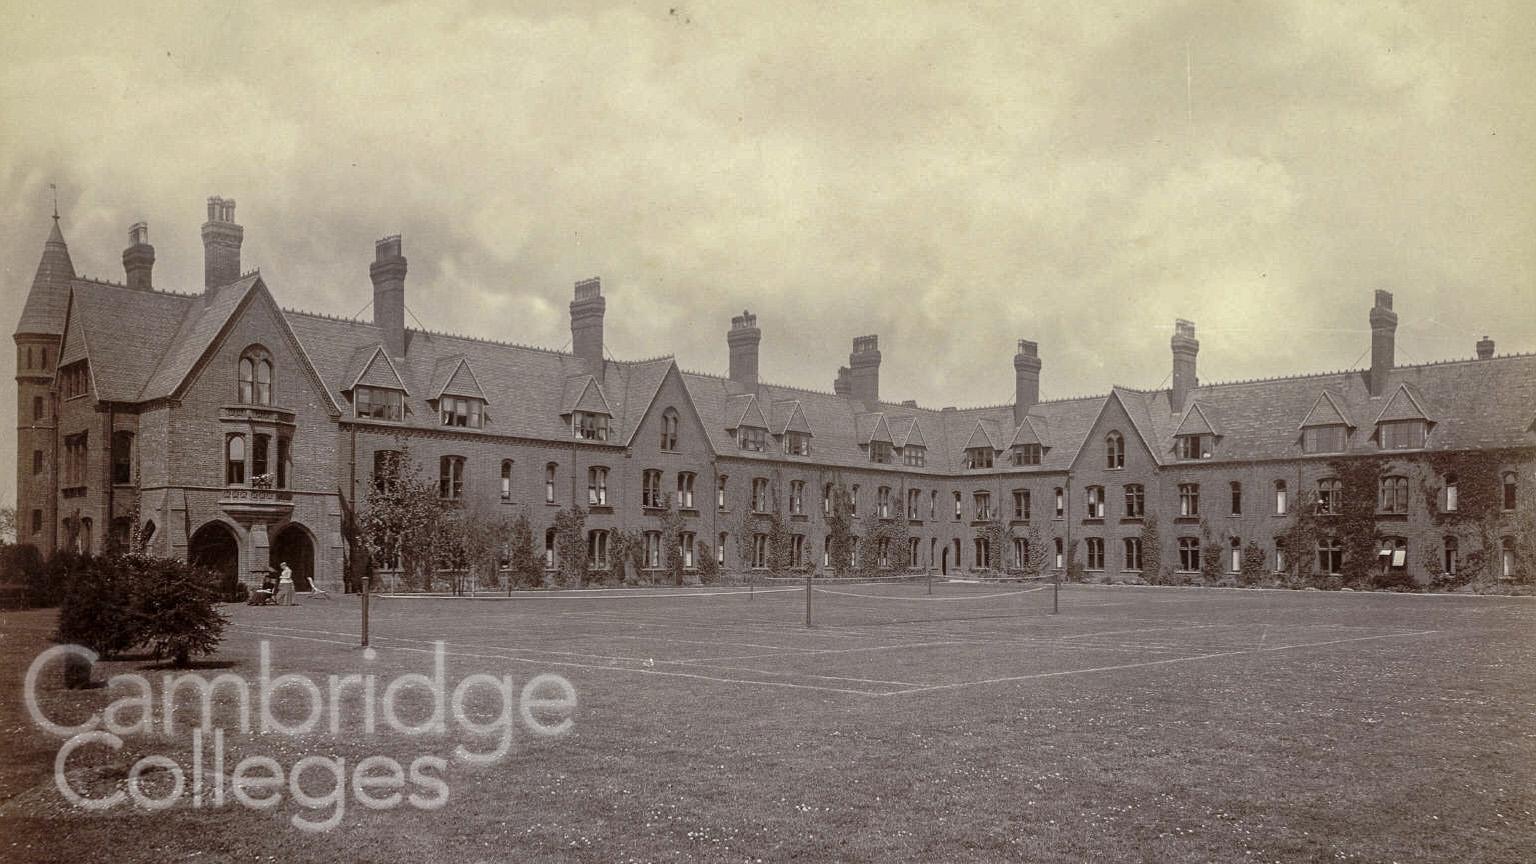 Girton College monochrome